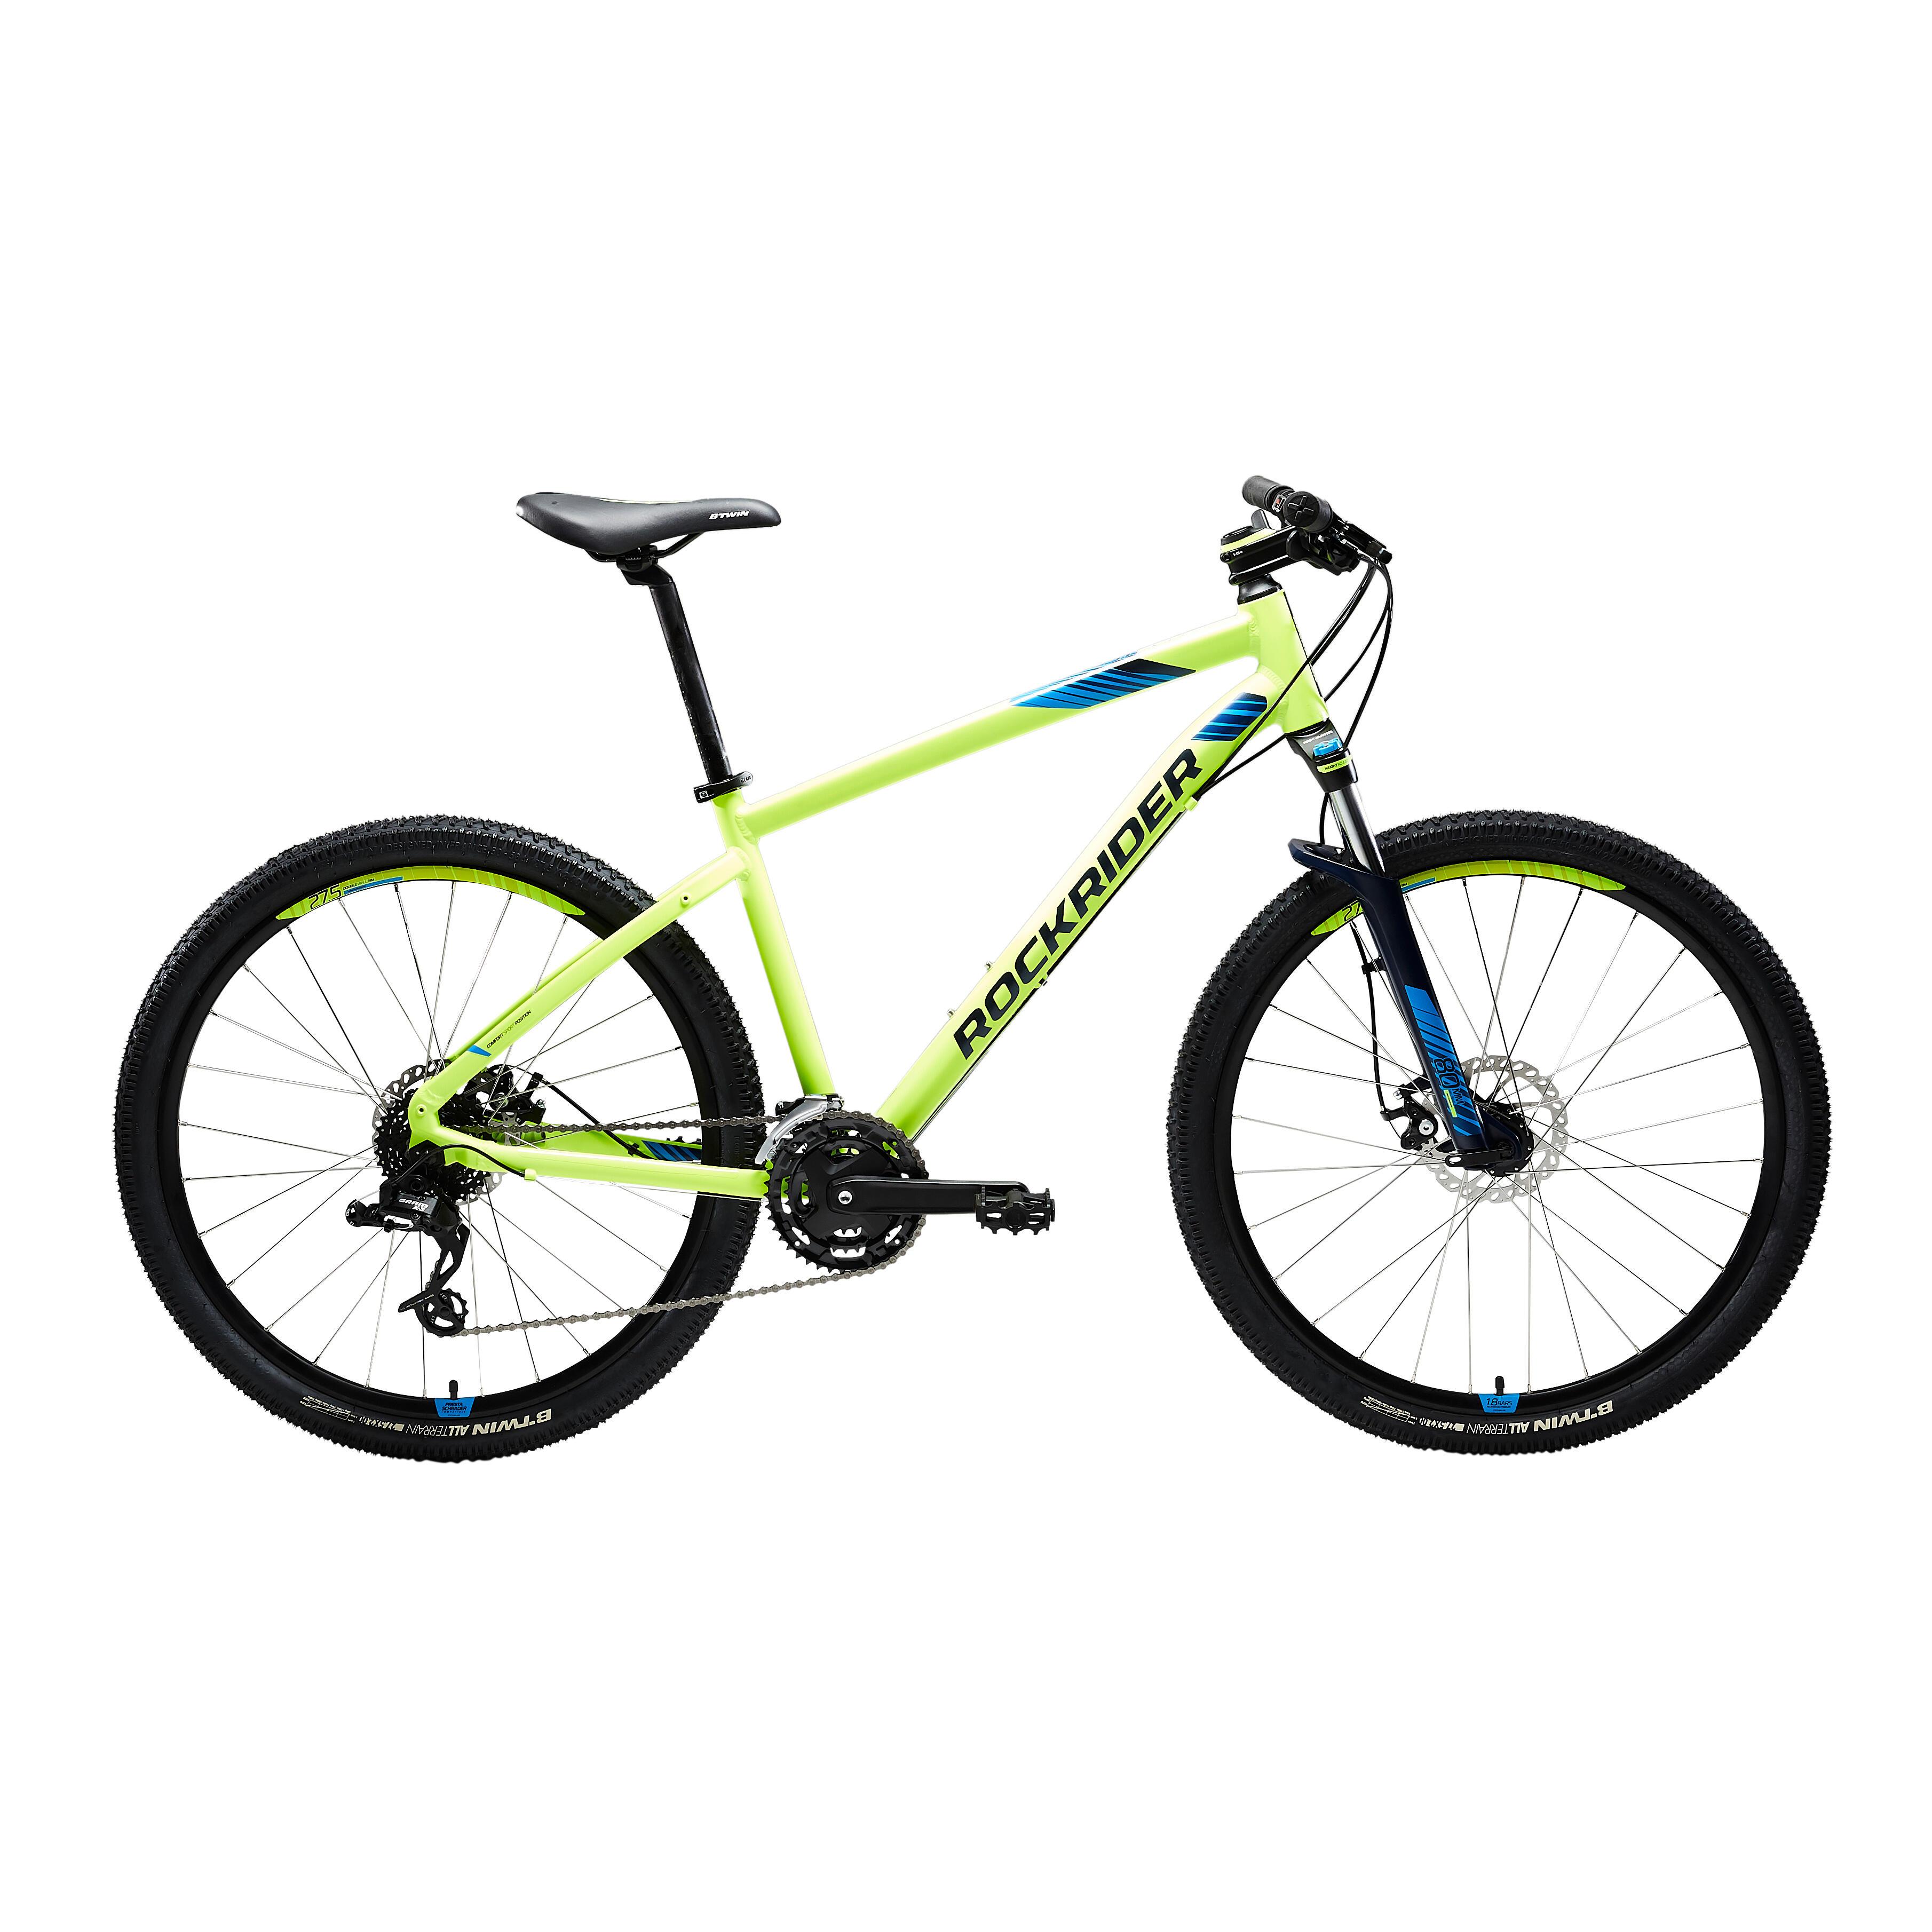 Rockrider MTB Rockrider ST 520 27.5″ SRAM X3 3×8-speed mountainbike